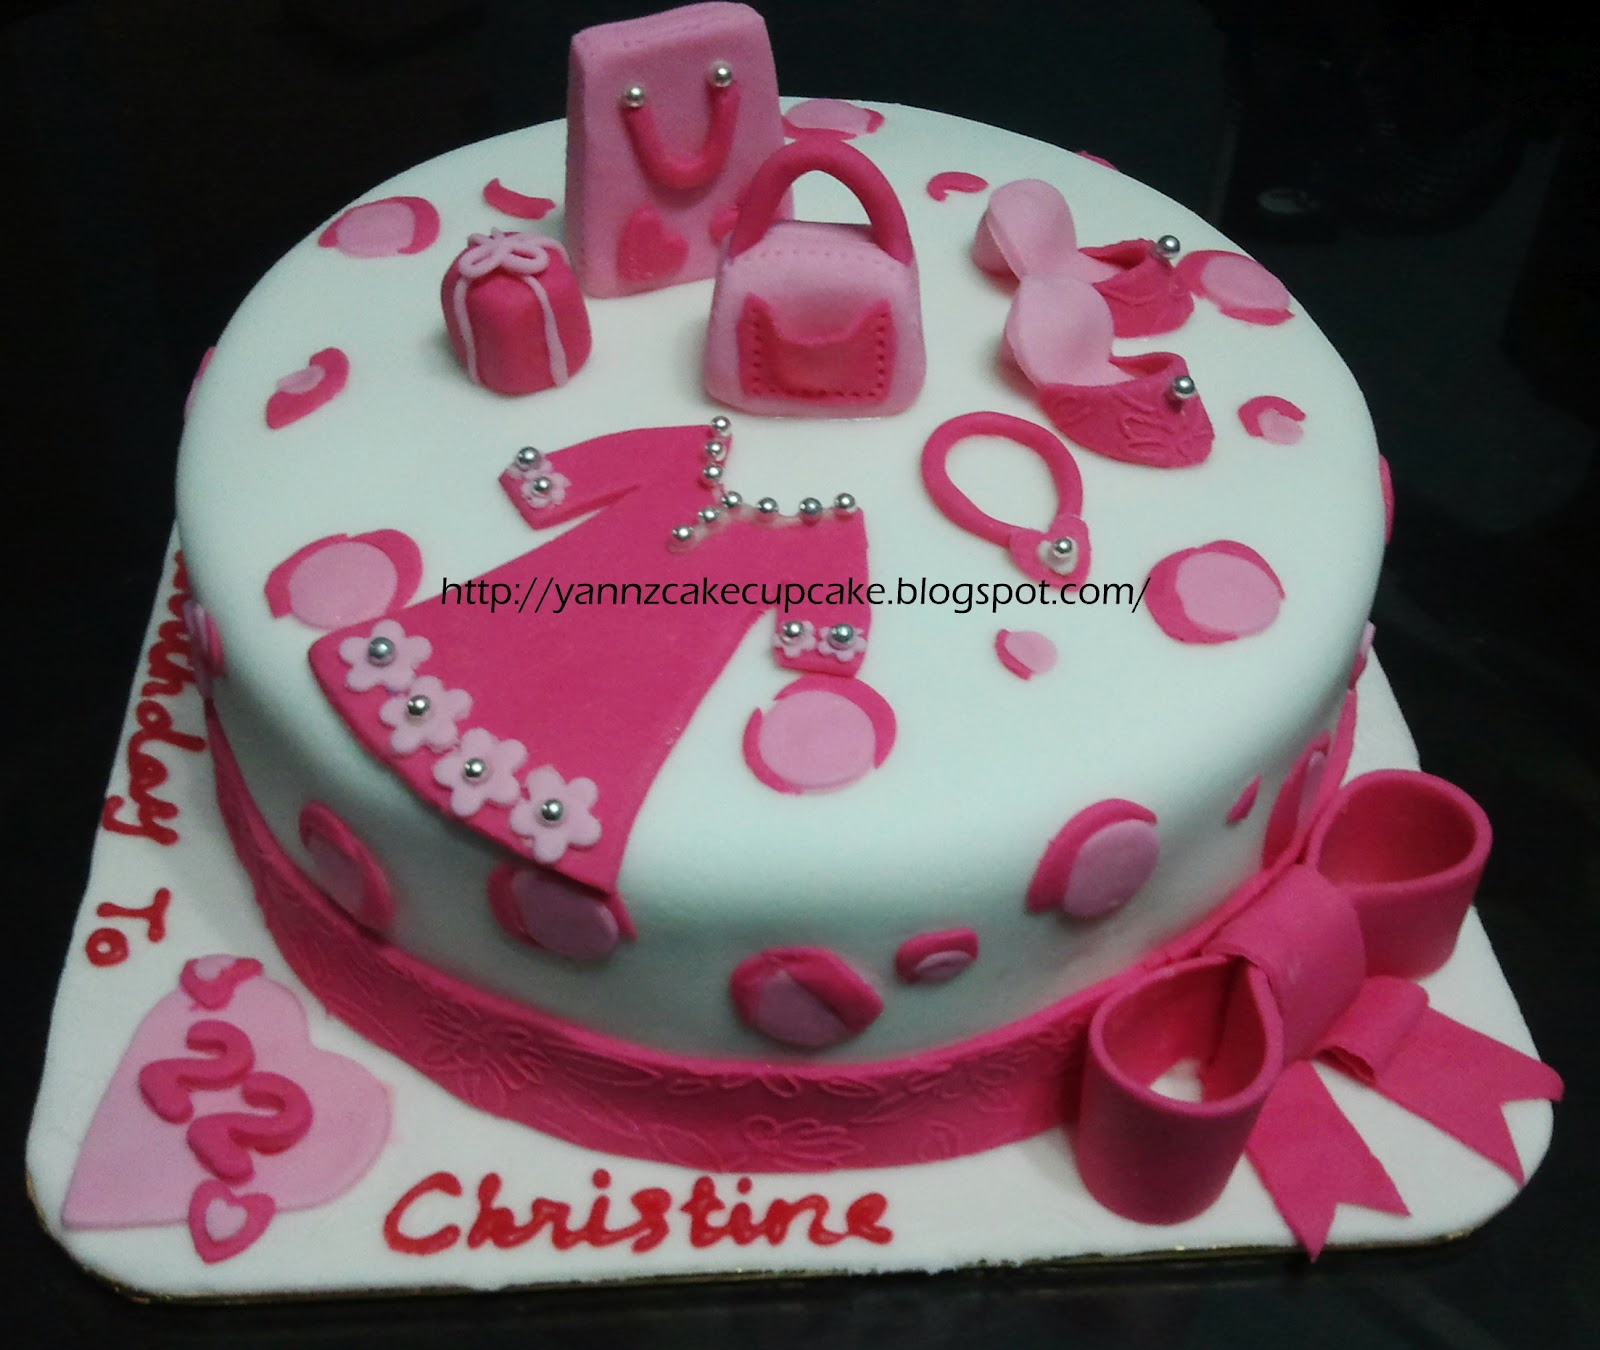 Christine 22nd Bday | yannzcakecupcakecom